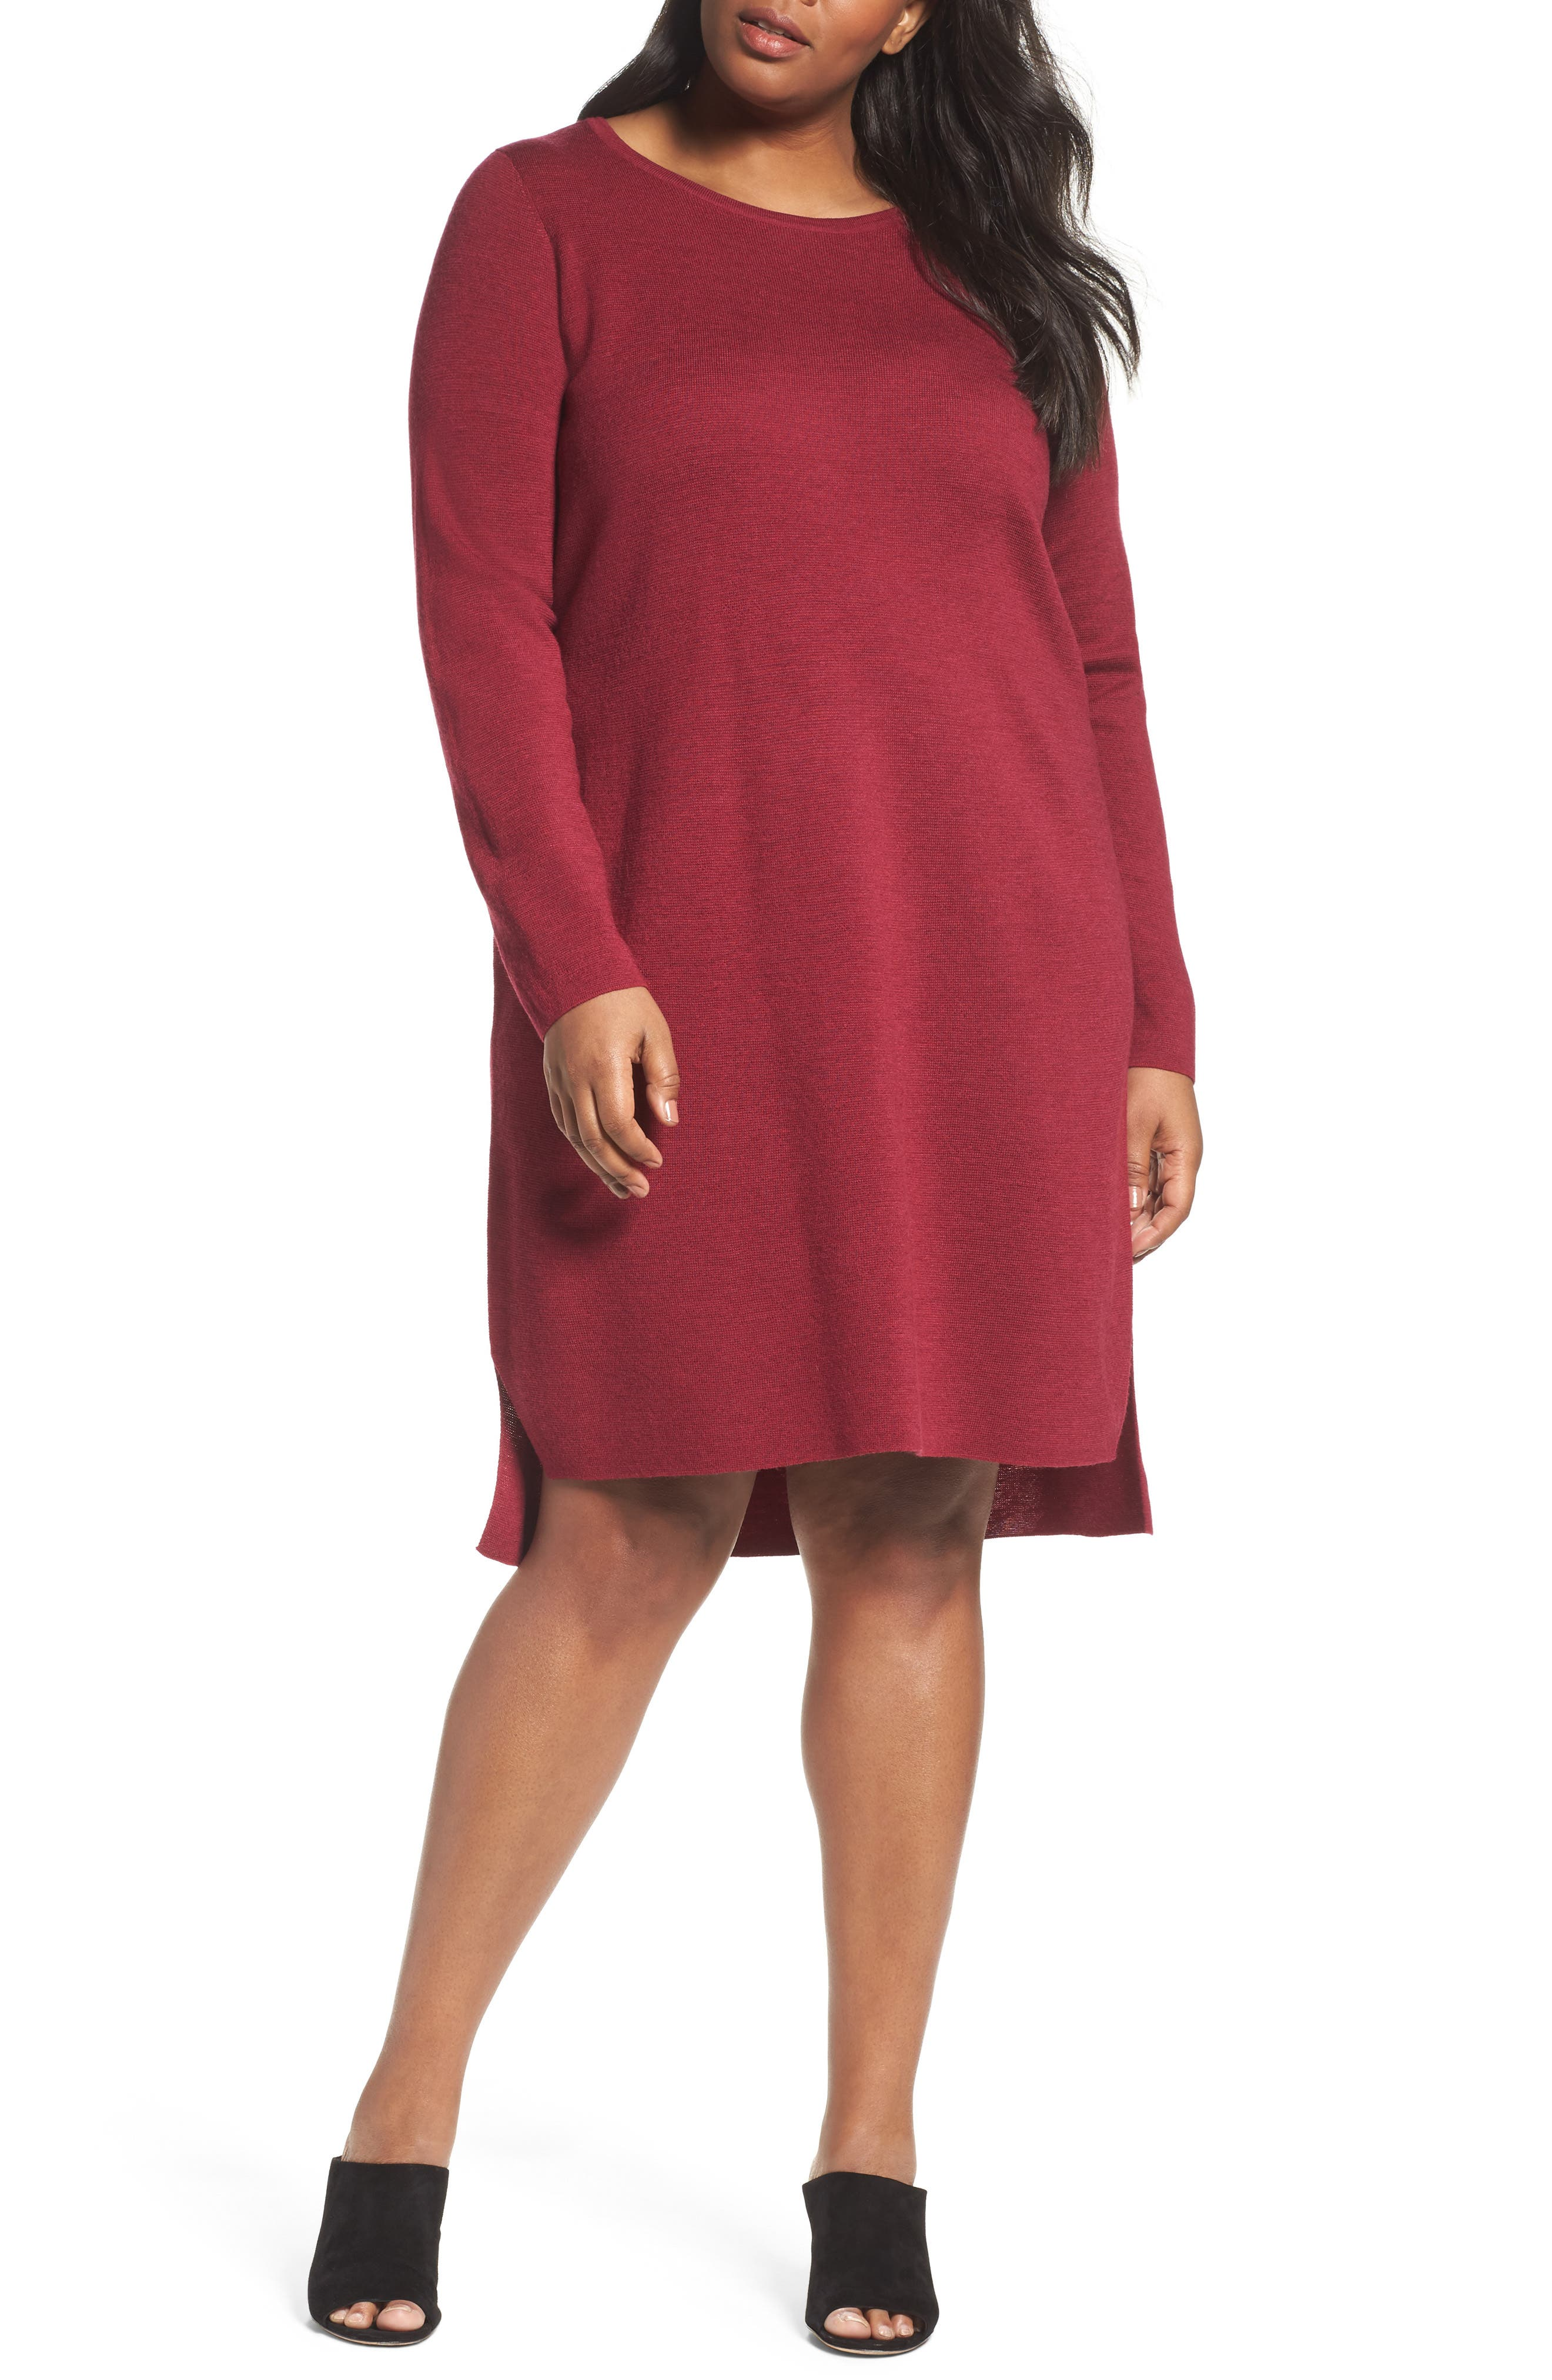 Alternate Image 1 Selected - Eileen Fisher Merino Wool Sweater Dress (Plus Size)